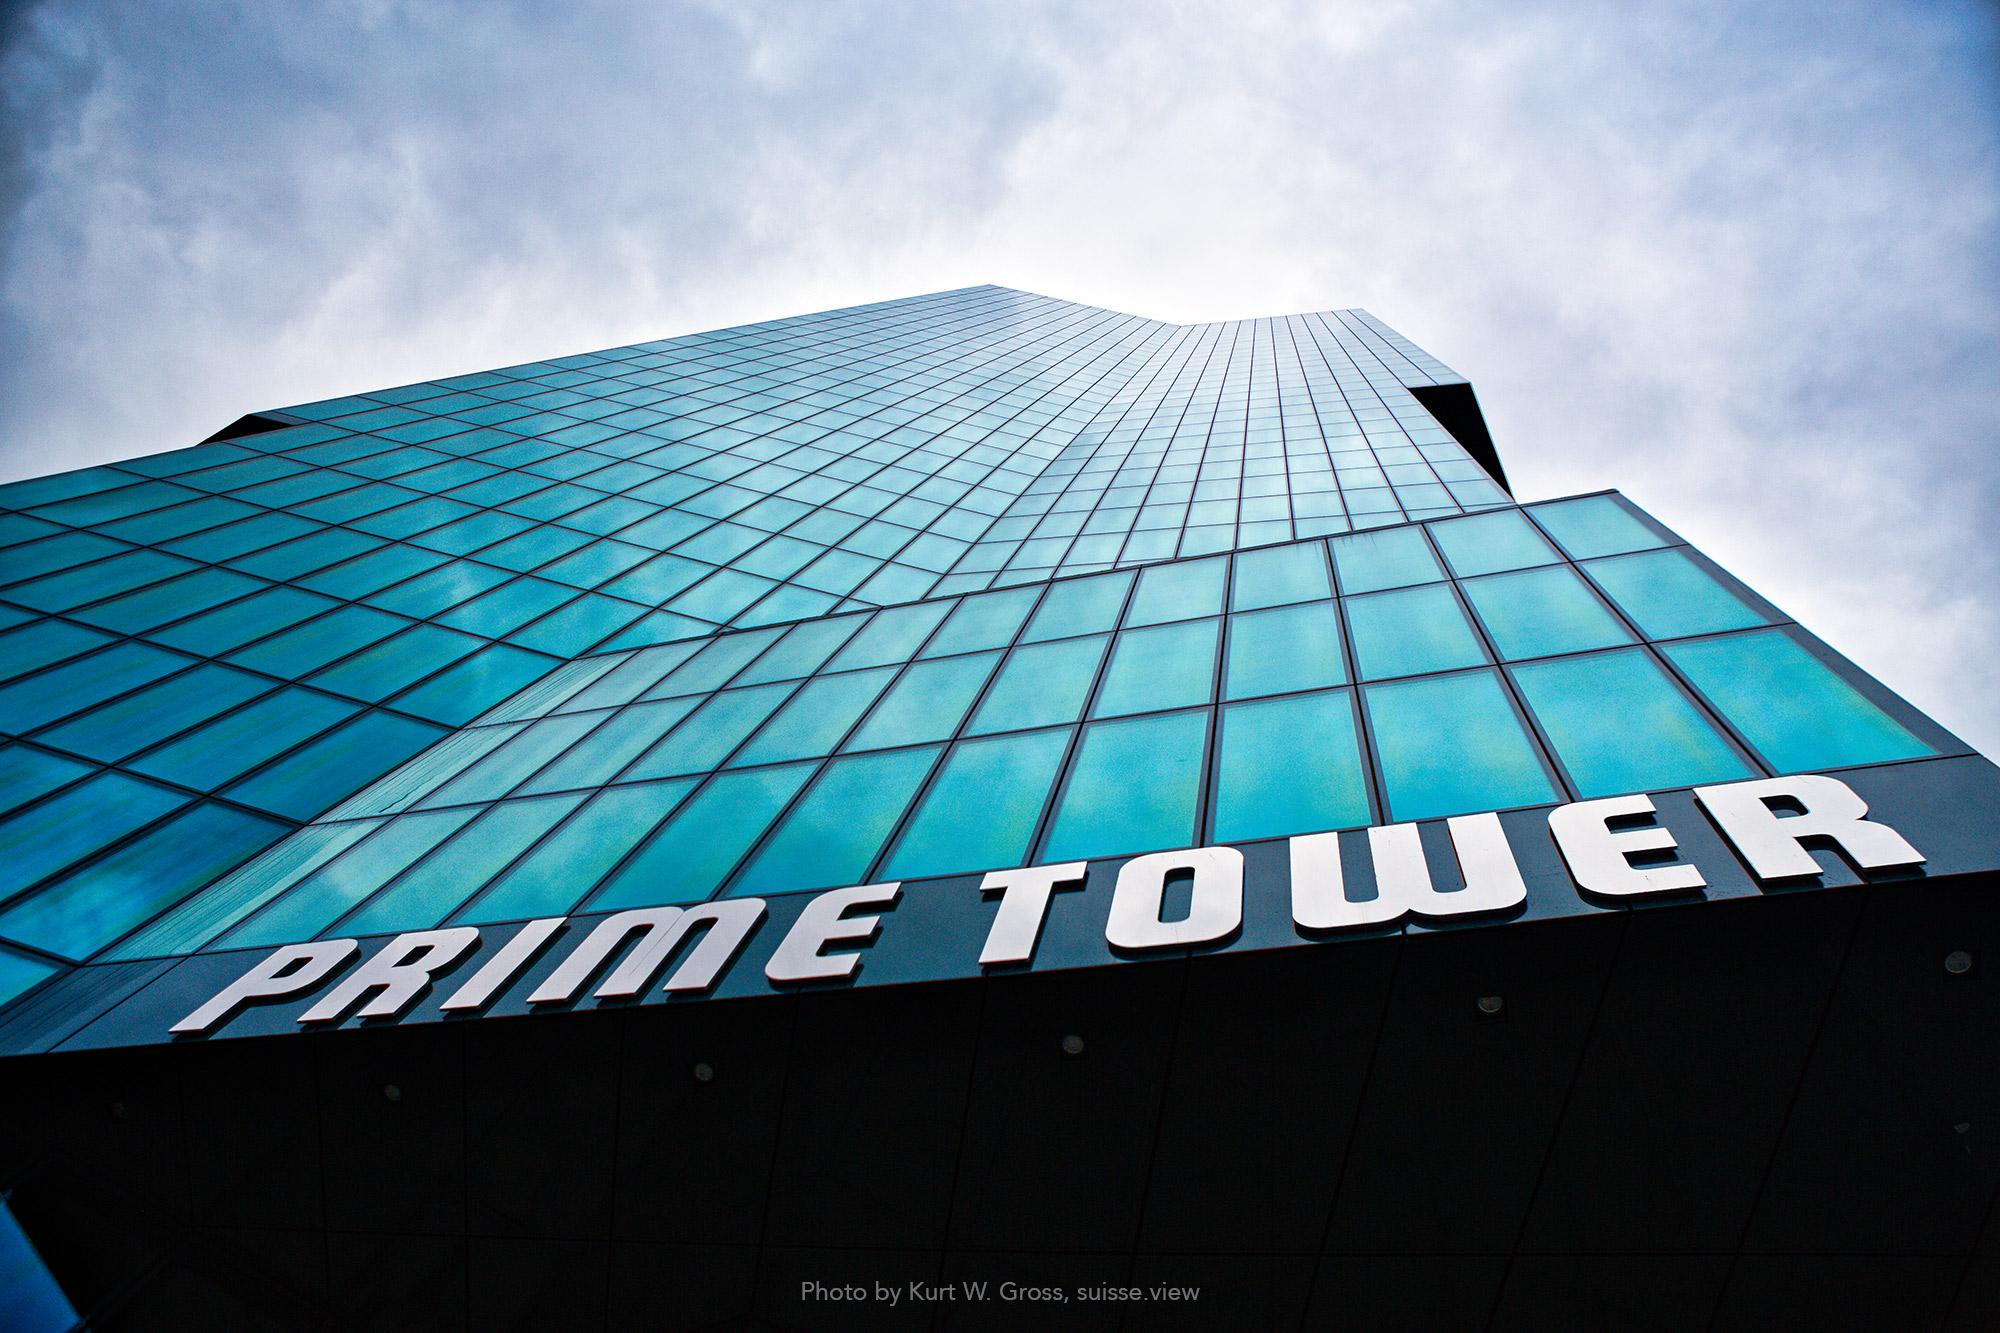 Prime Tower, Switzerland